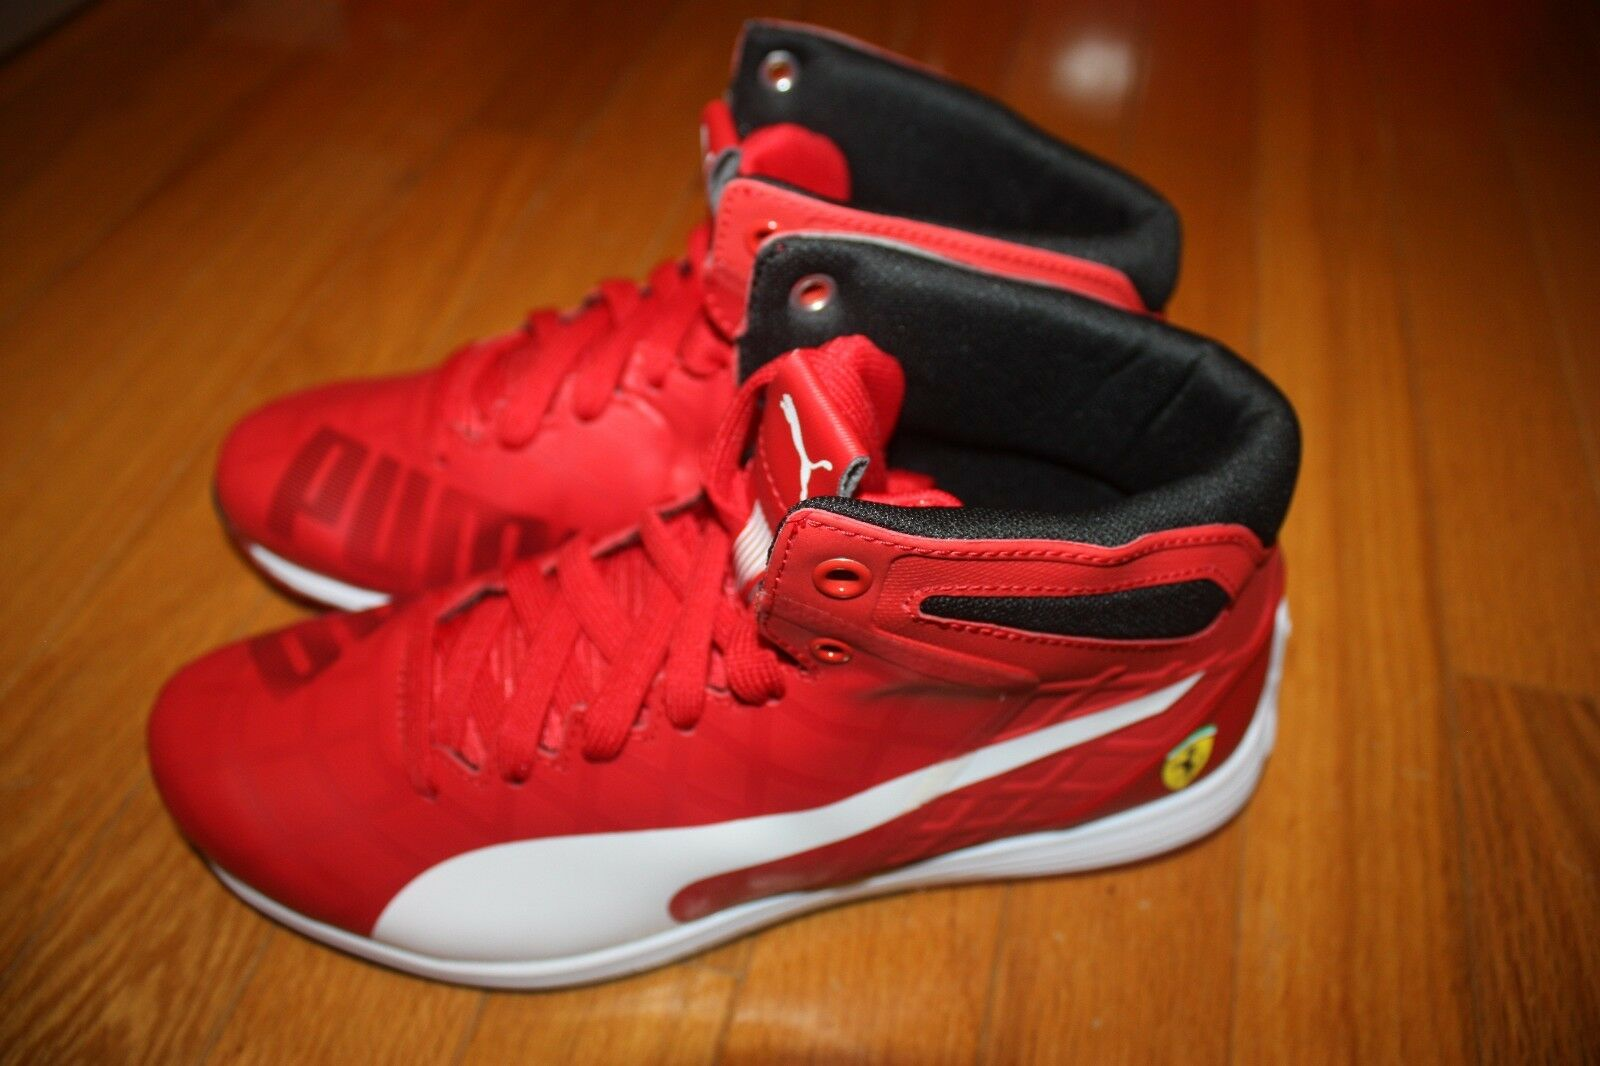 Brand New In Box PUMA Ferrari evoSPEED 1.4 Mid Men's shoes RED SHIP FREE US FAST